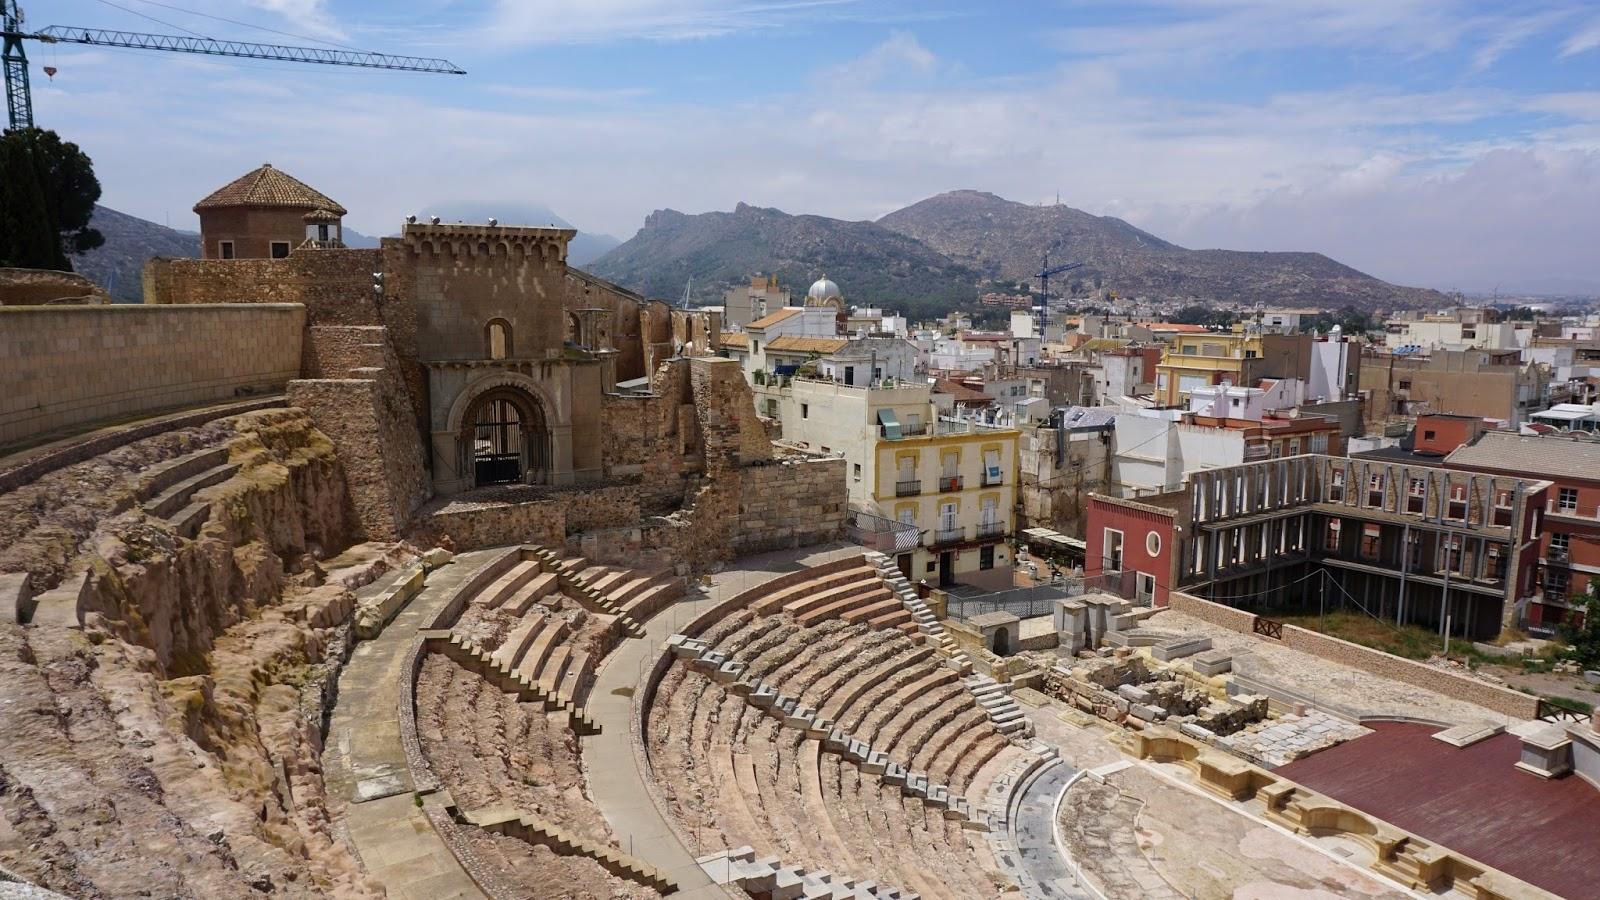 Catedral Vieja Santa Maria, Hiszpania ruiny, starożytne ruiny Kartagena, atrakcje Kartageny, prowincja Murcja,  Costa Calida